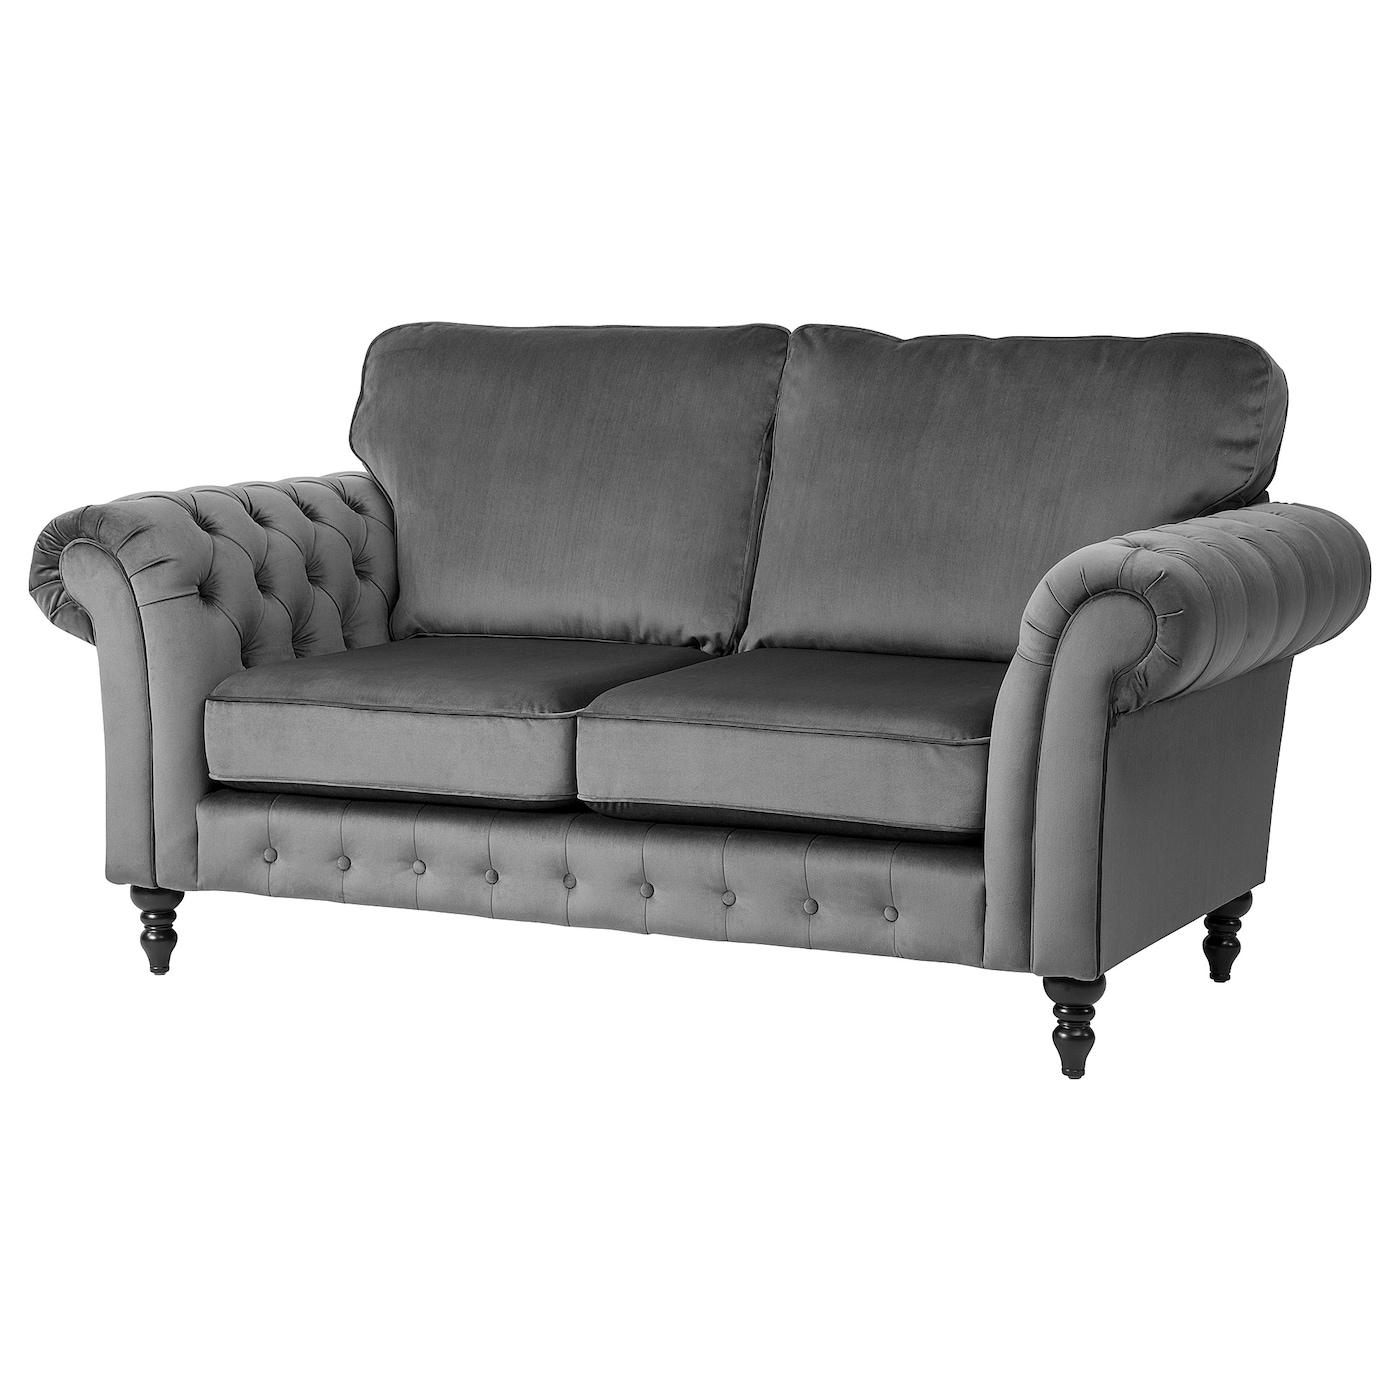 Ikea Grevie 2 Seat Sofa